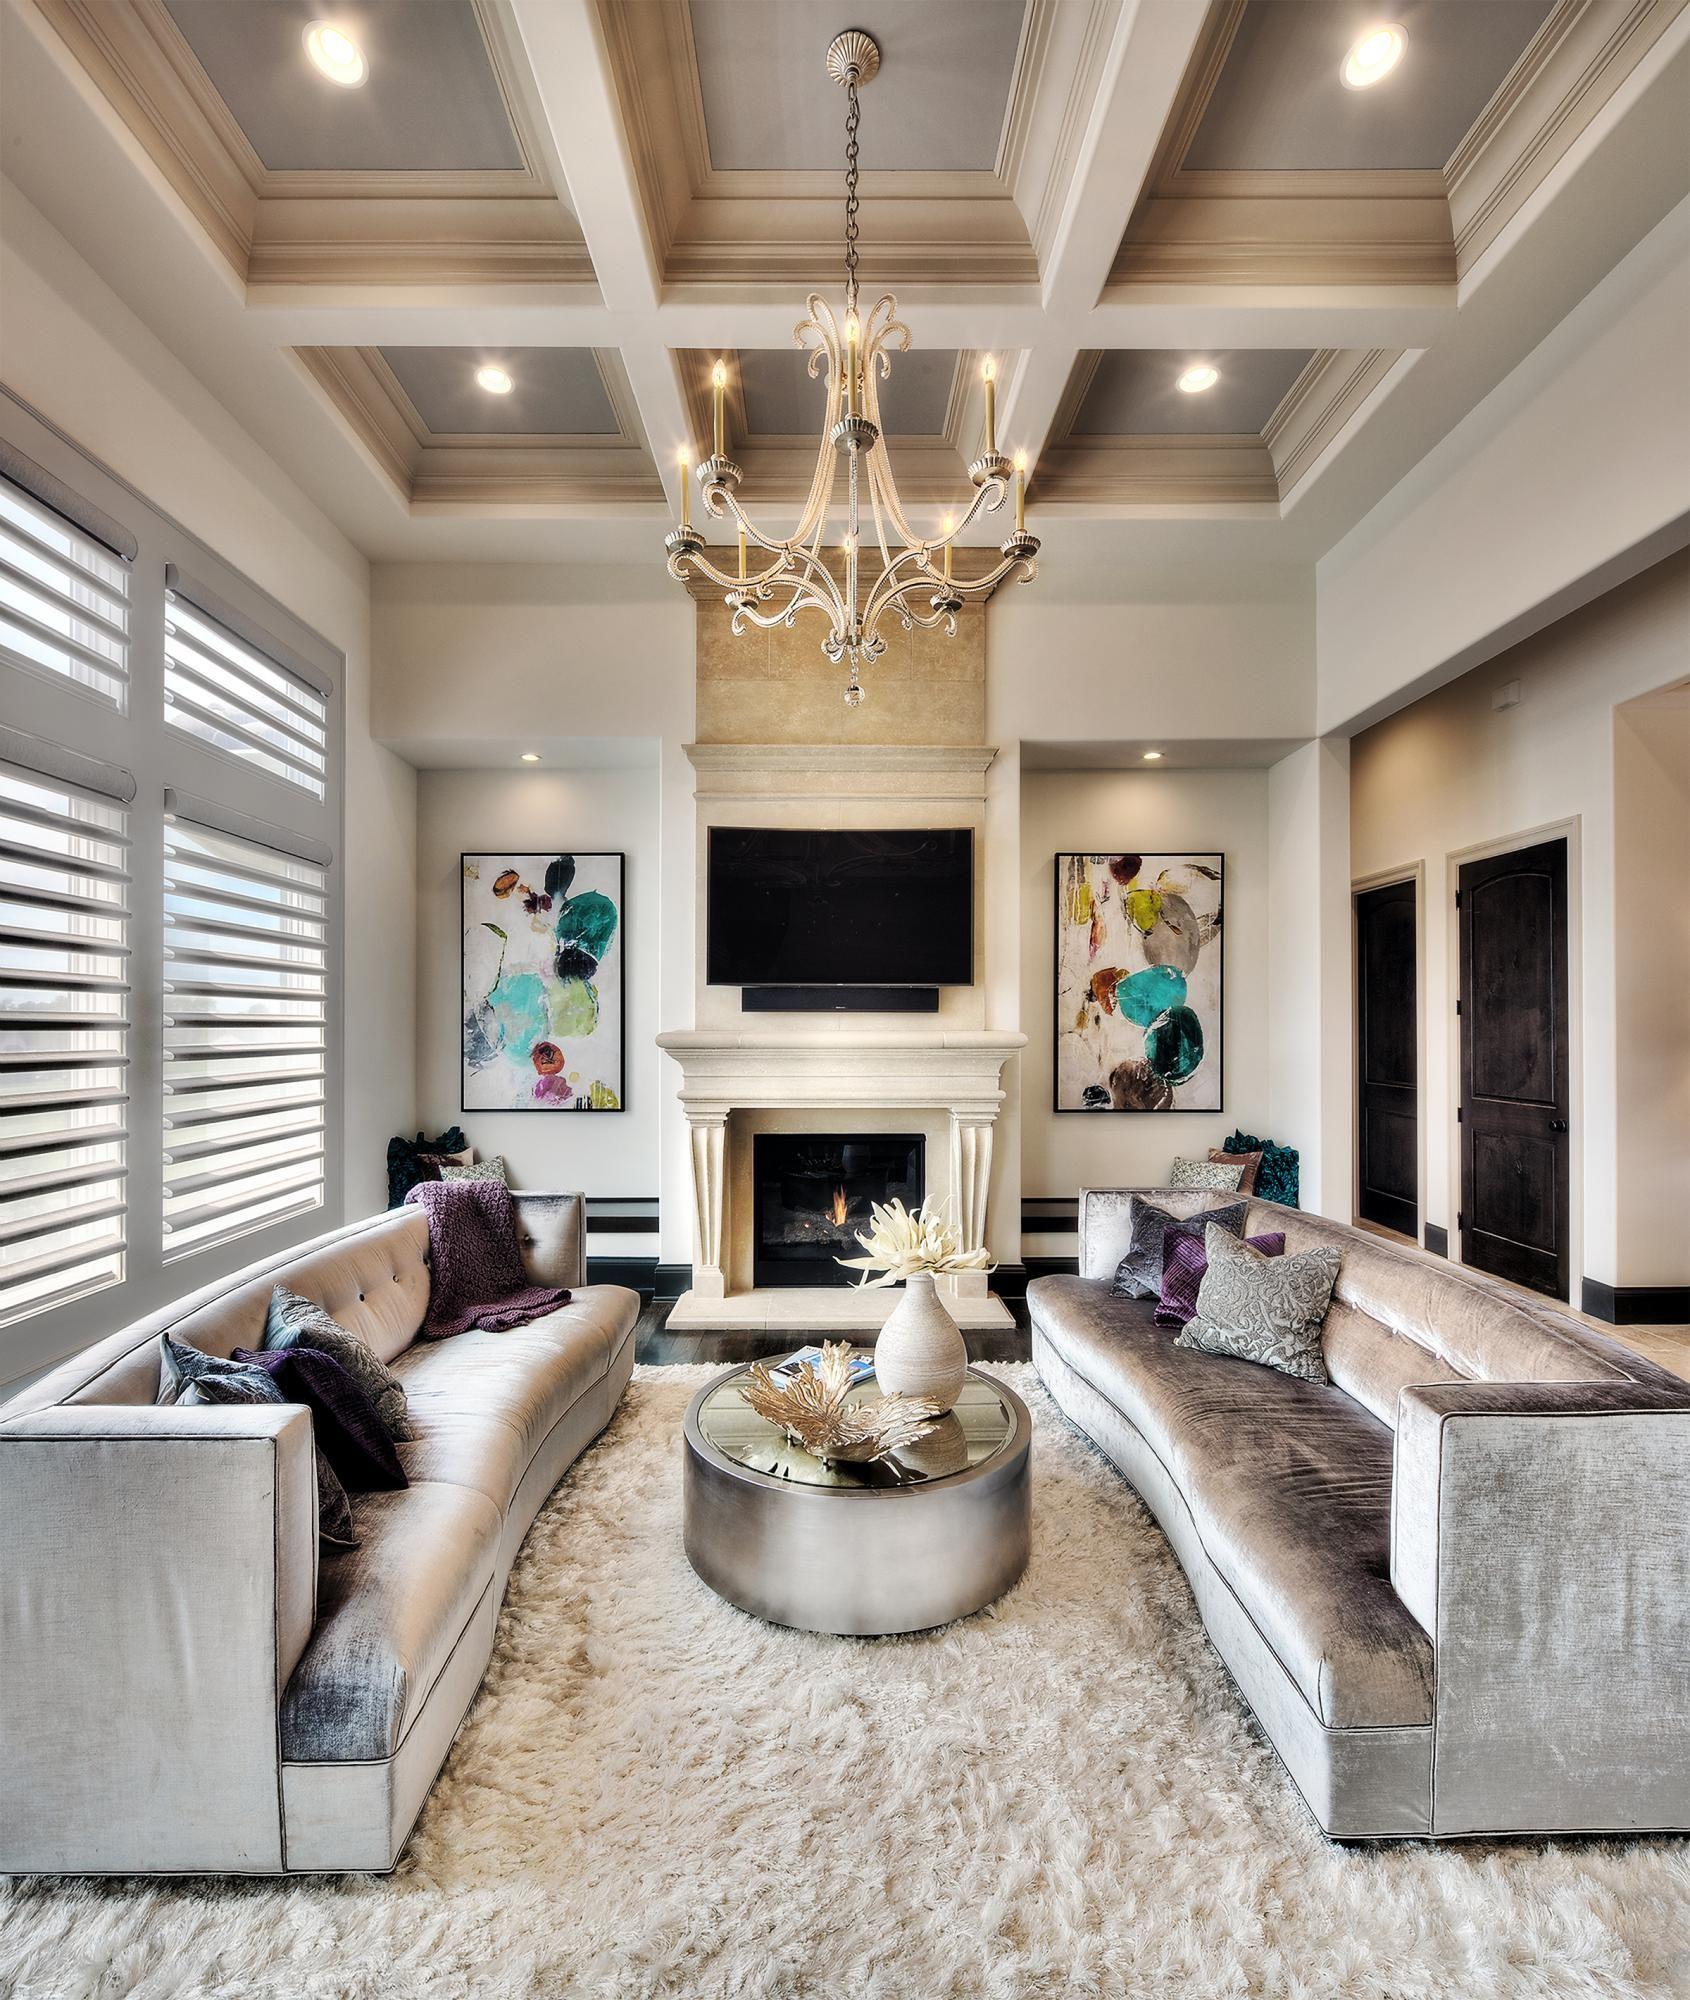 Hearthrooms Photo Gallery Custom Homes In Kansas City Ks Starr Homes Home Decor Cream Living Room Decor Home